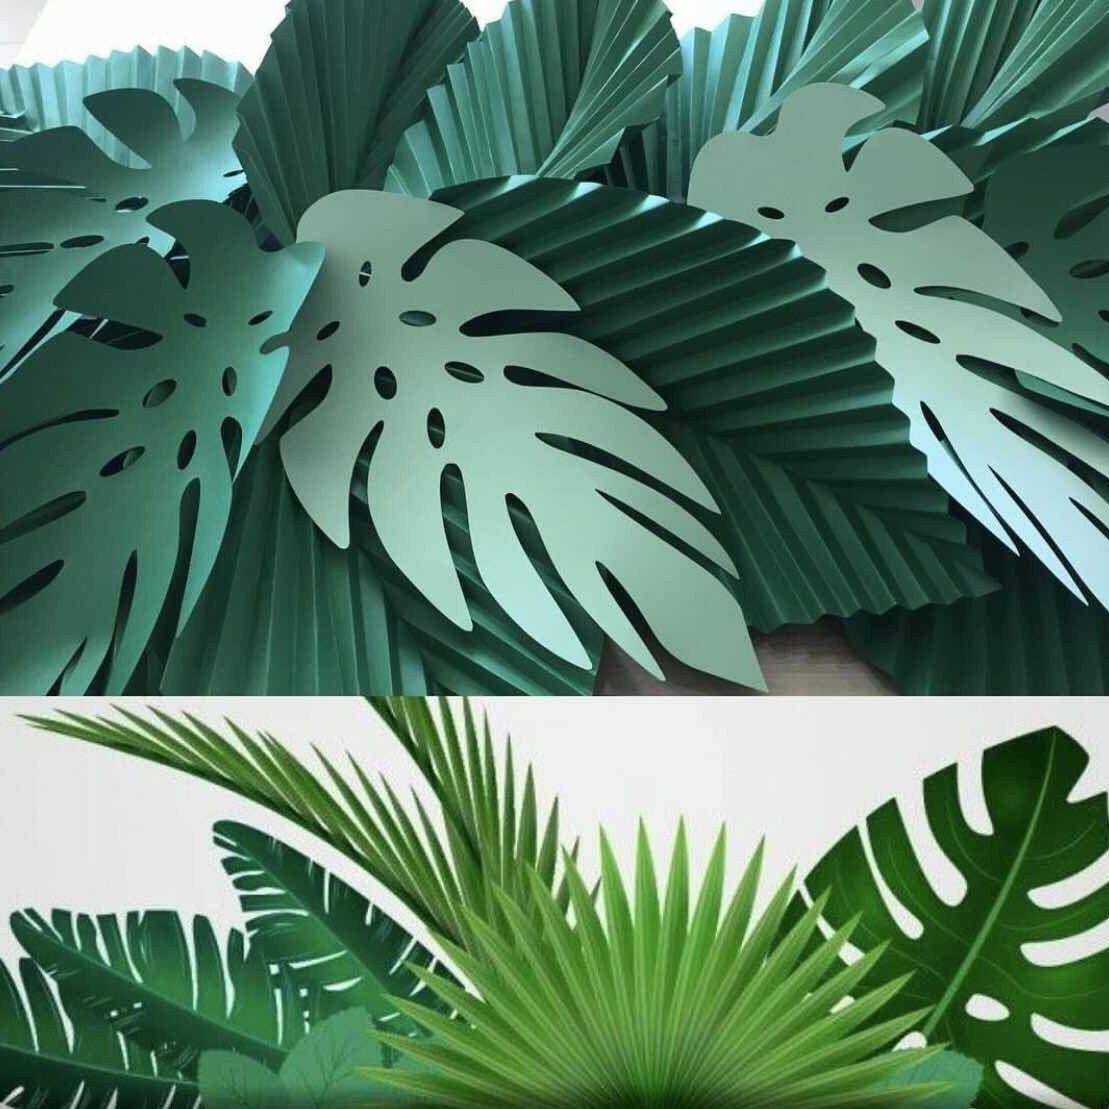 svg digital leaf template 5 cricut and silhouette ready